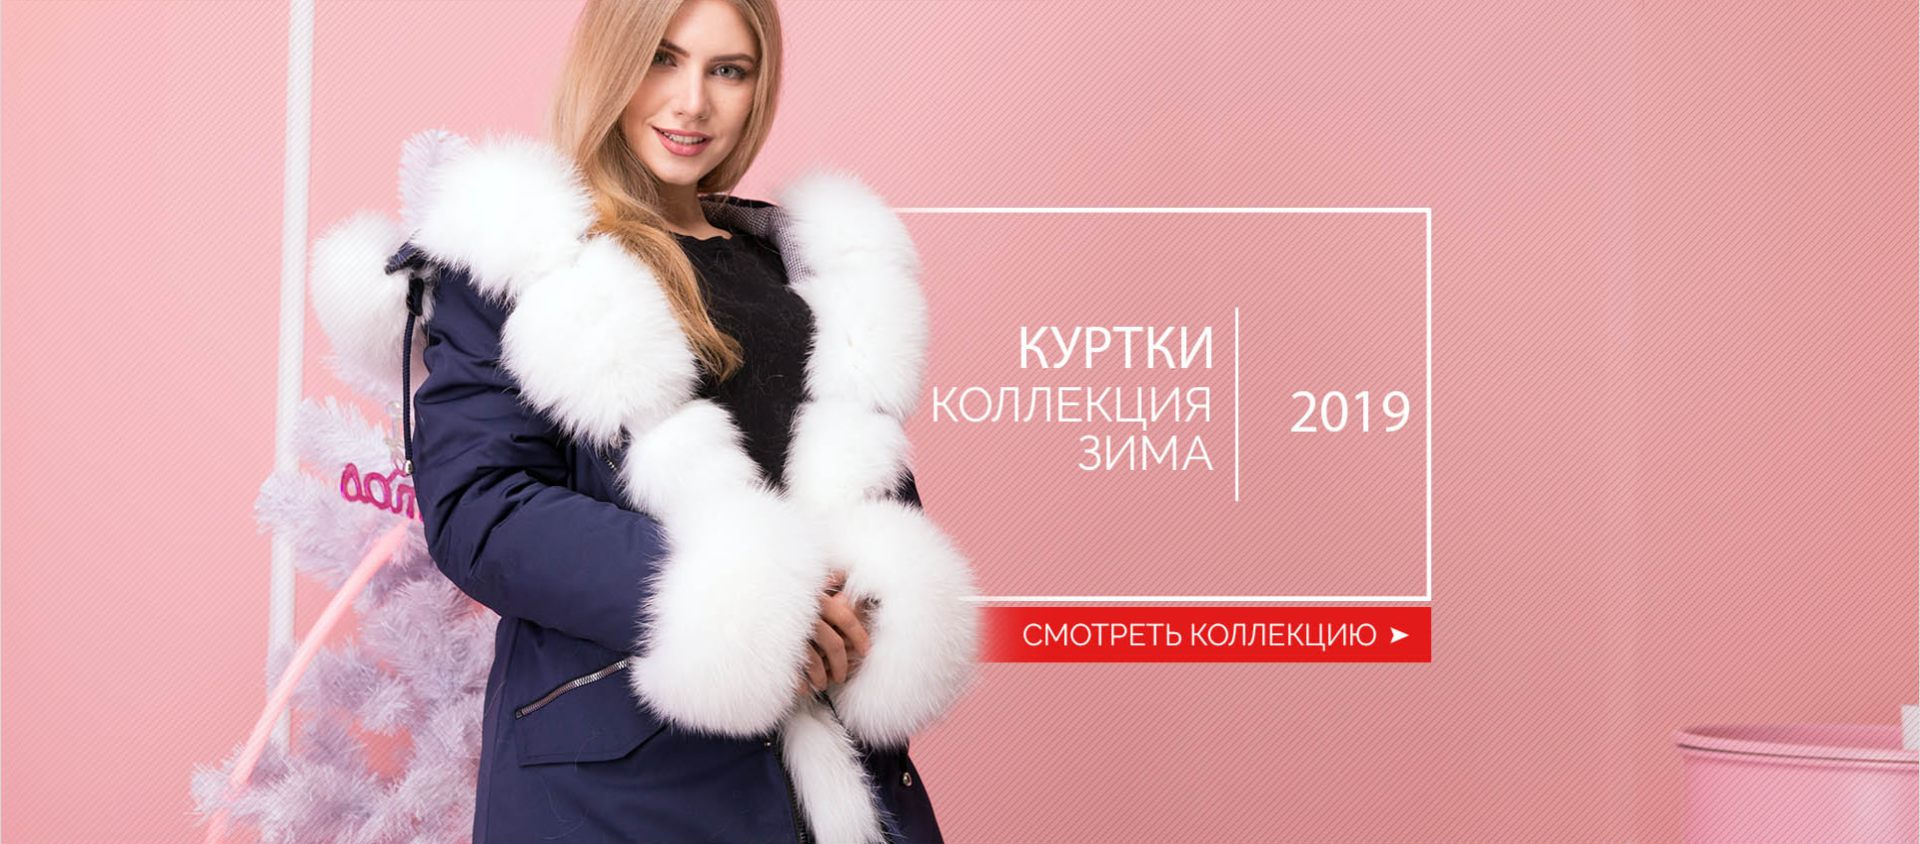 https://lady-elegance.com.ua/wp-content/uploads/2018/08/BAnner.jpg